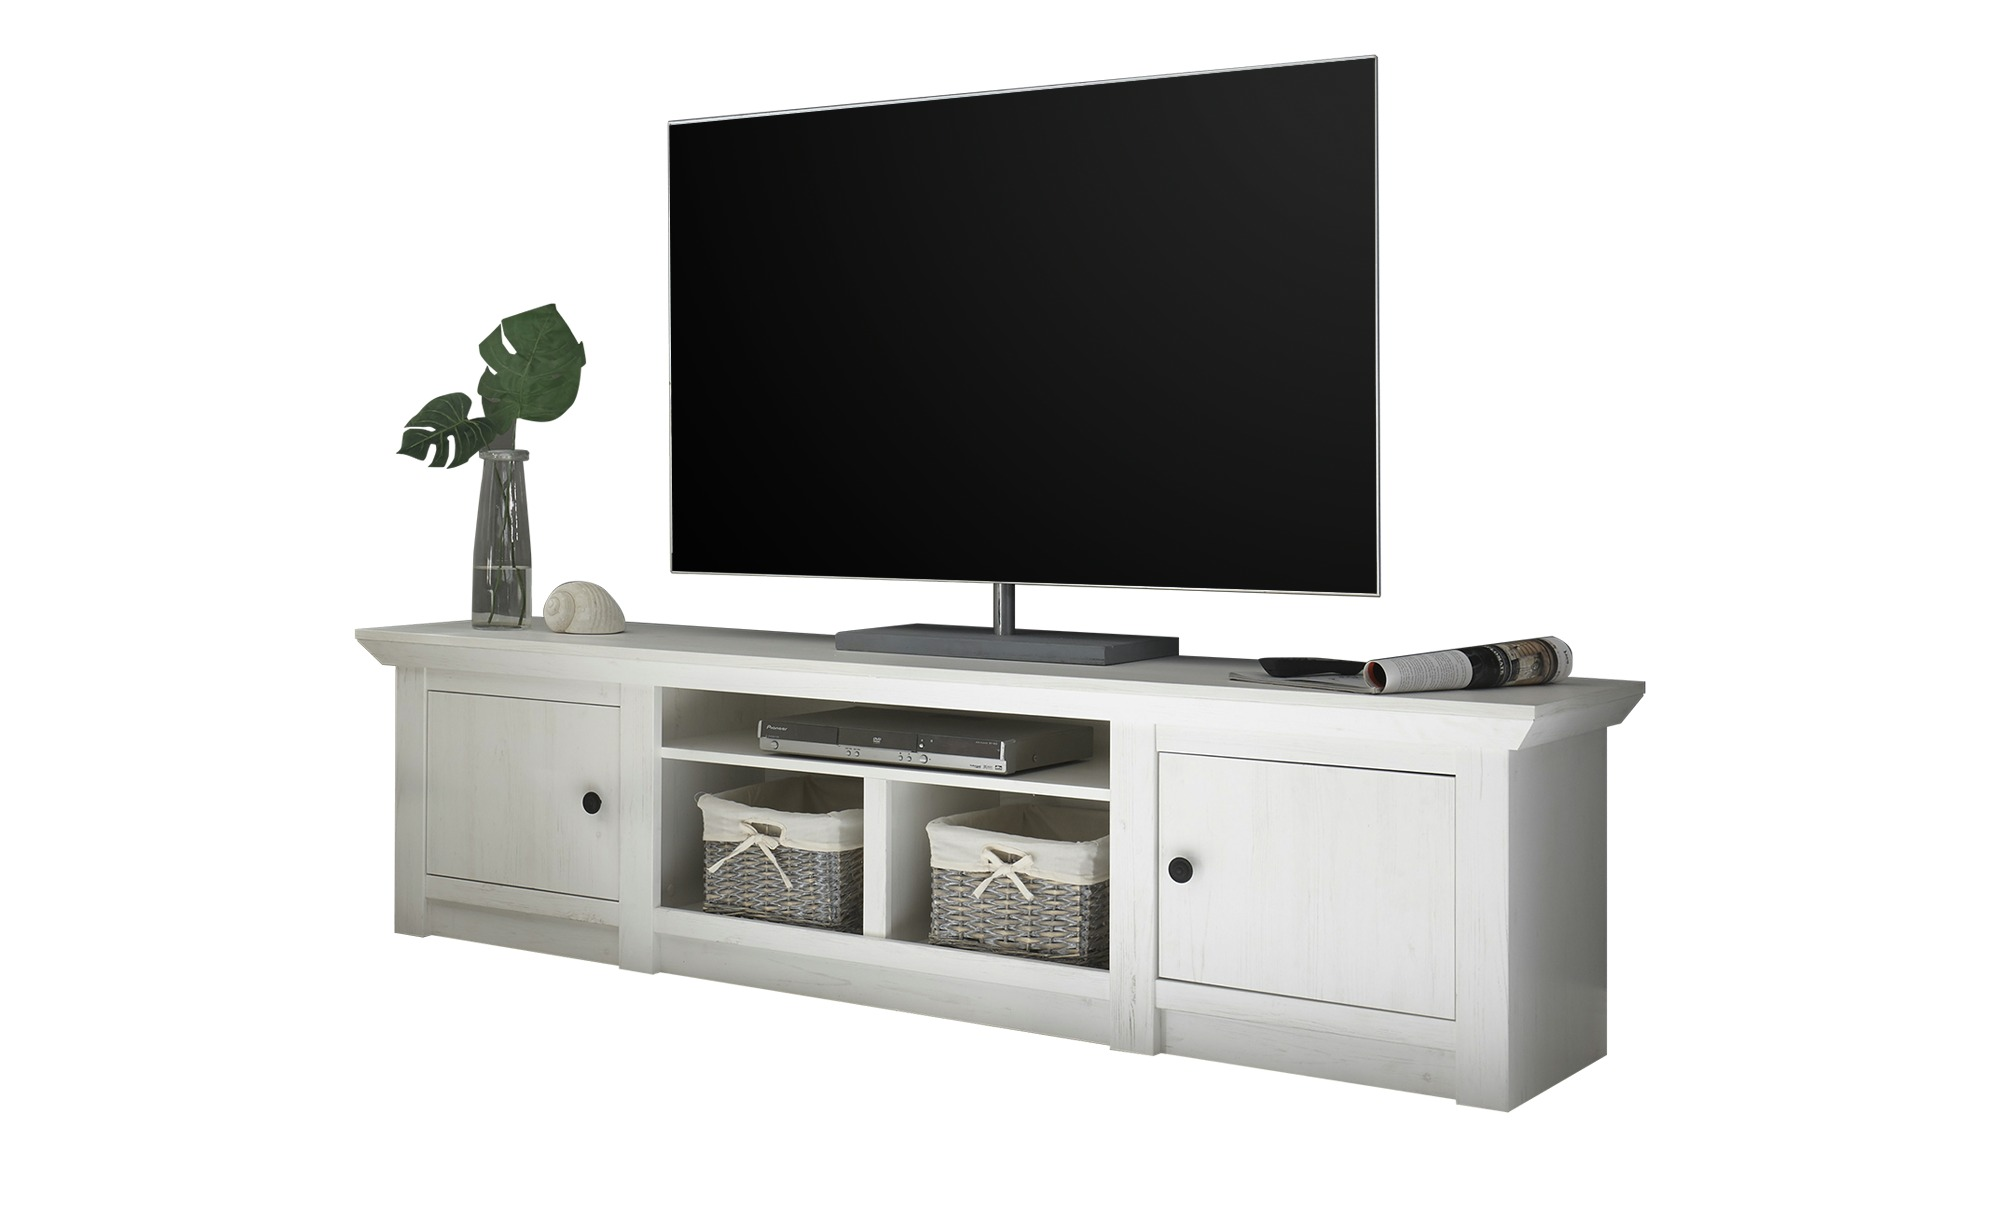 TV-Lowboard  Atina ¦ weiß ¦ Maße (cm): B: 194 H: 51 T: 45 Kommoden & Sideboards > Lowboards - Höffner